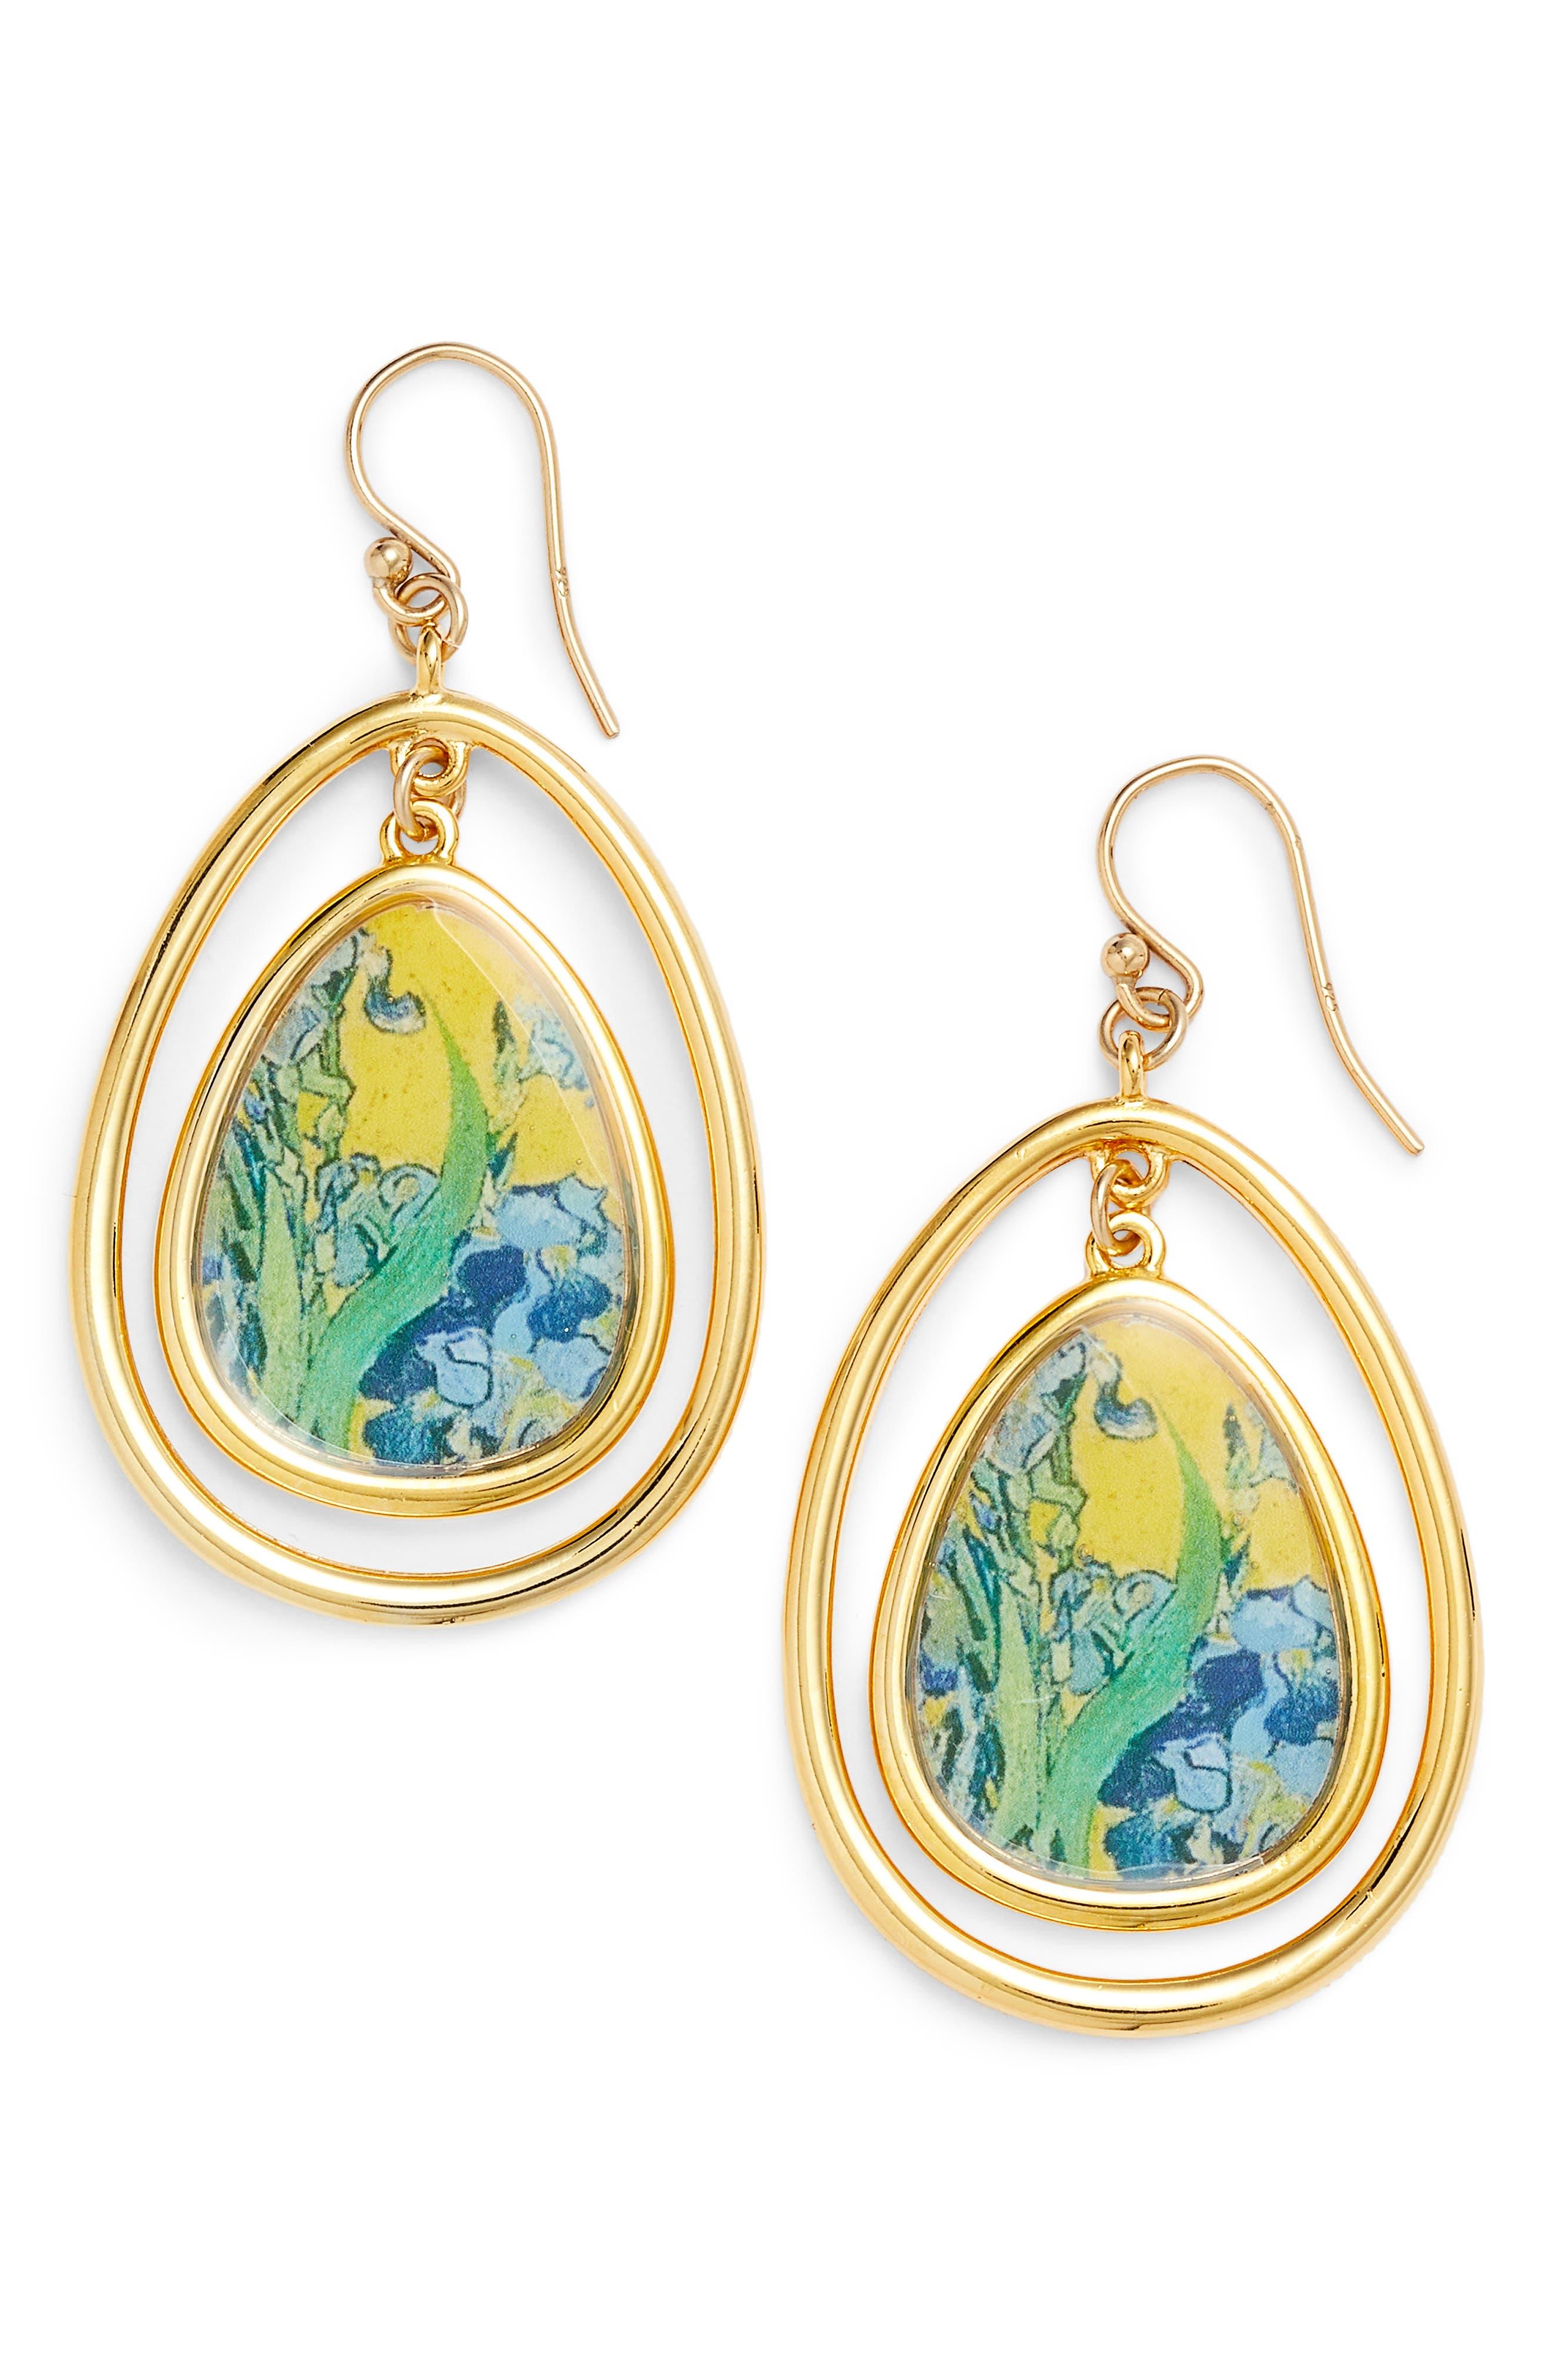 Irises Teardrop Drop Earrings,                         Main,                         color, YELLOW